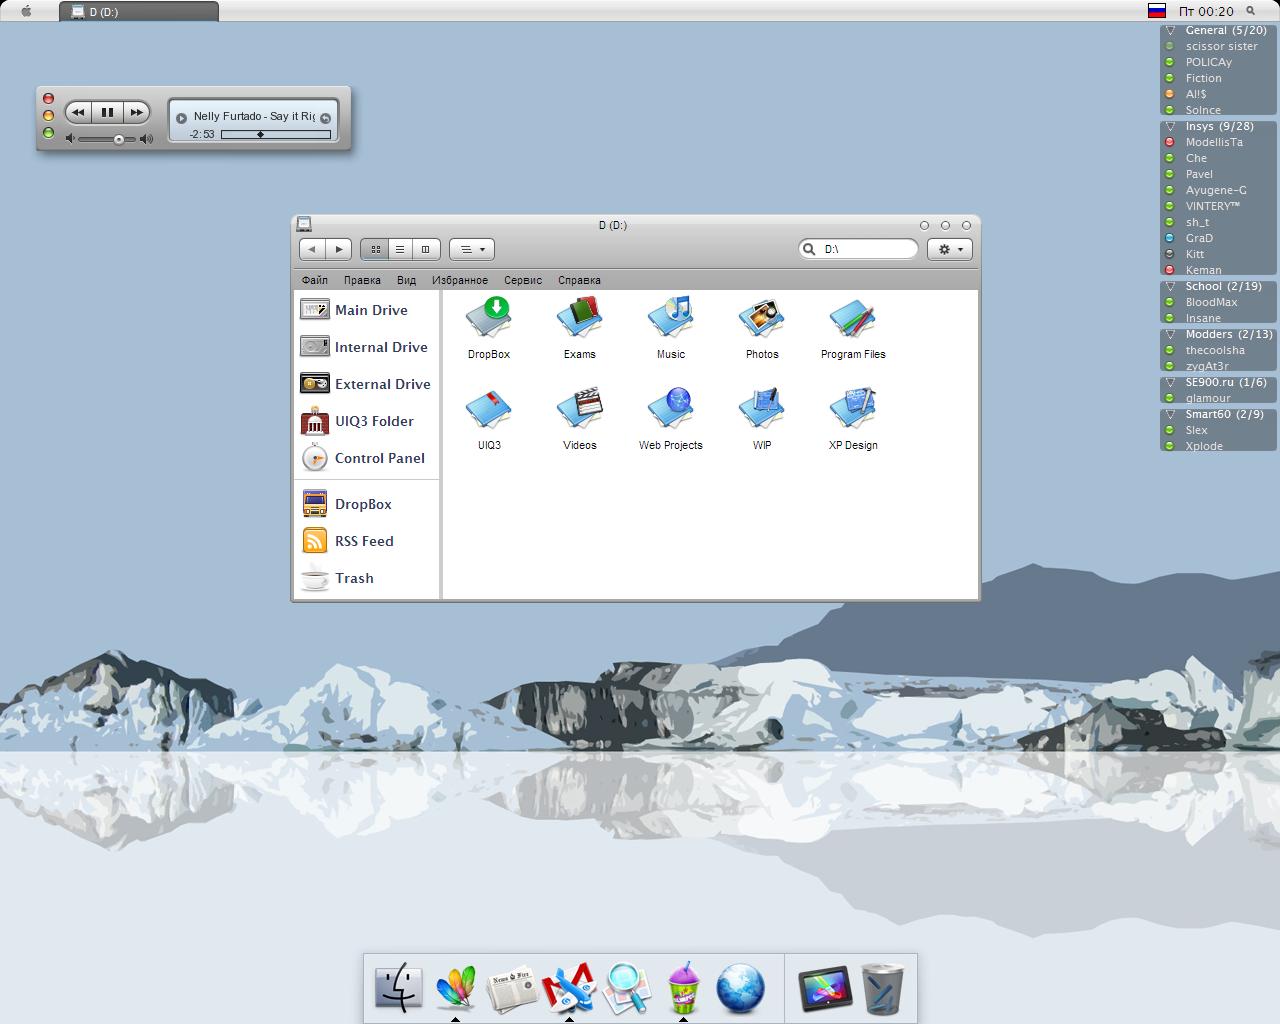 11.05.07 Desktop by Steeply